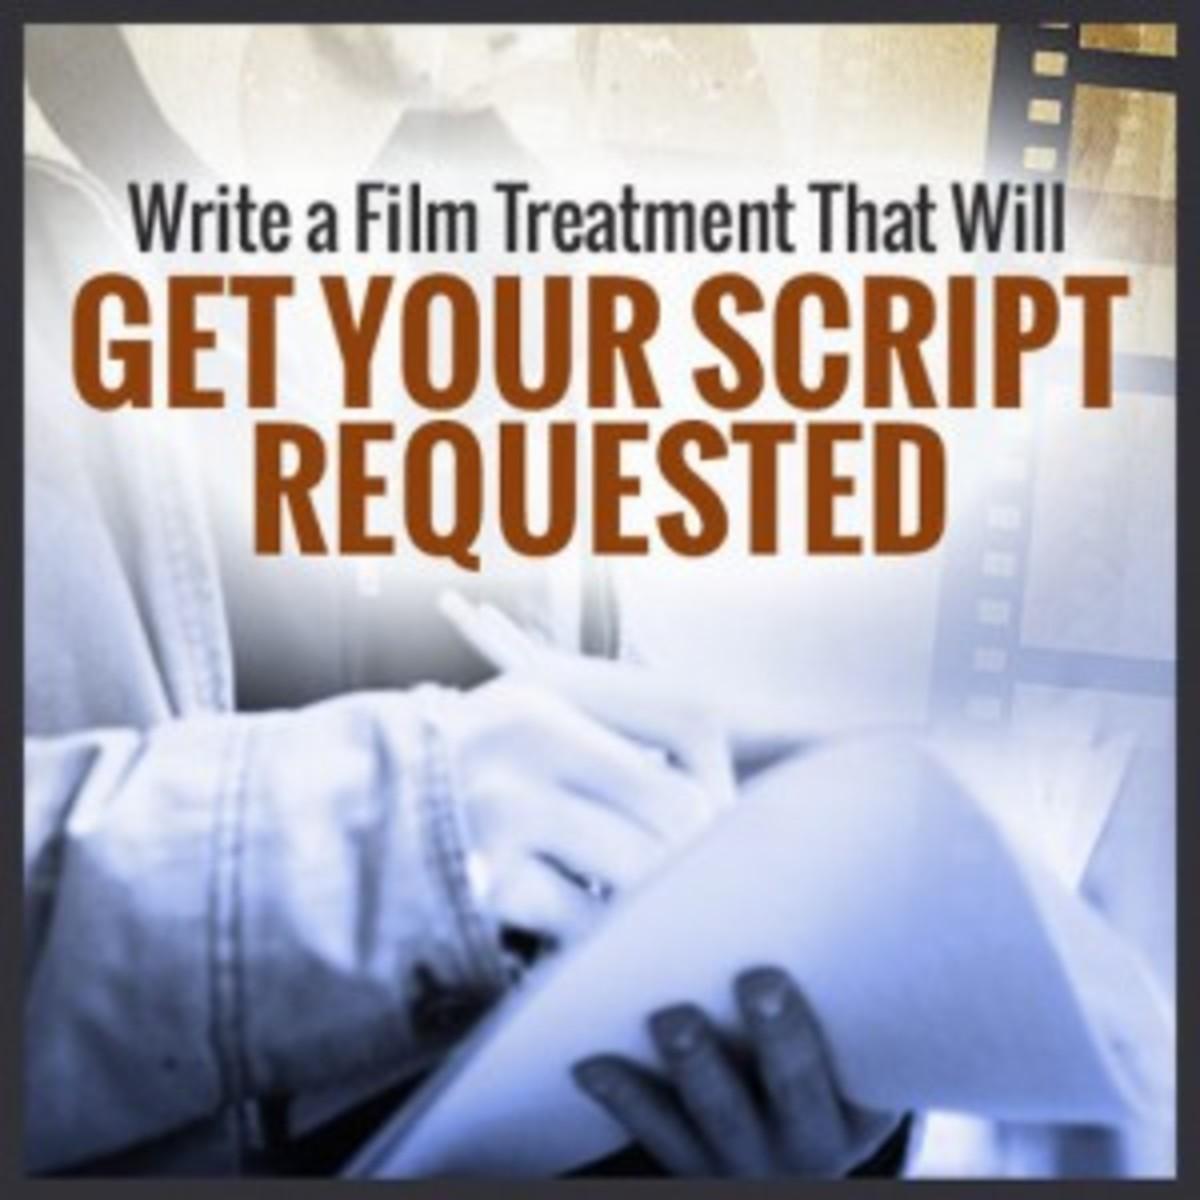 ws_filmtreatmentscript-500.jpg_medium